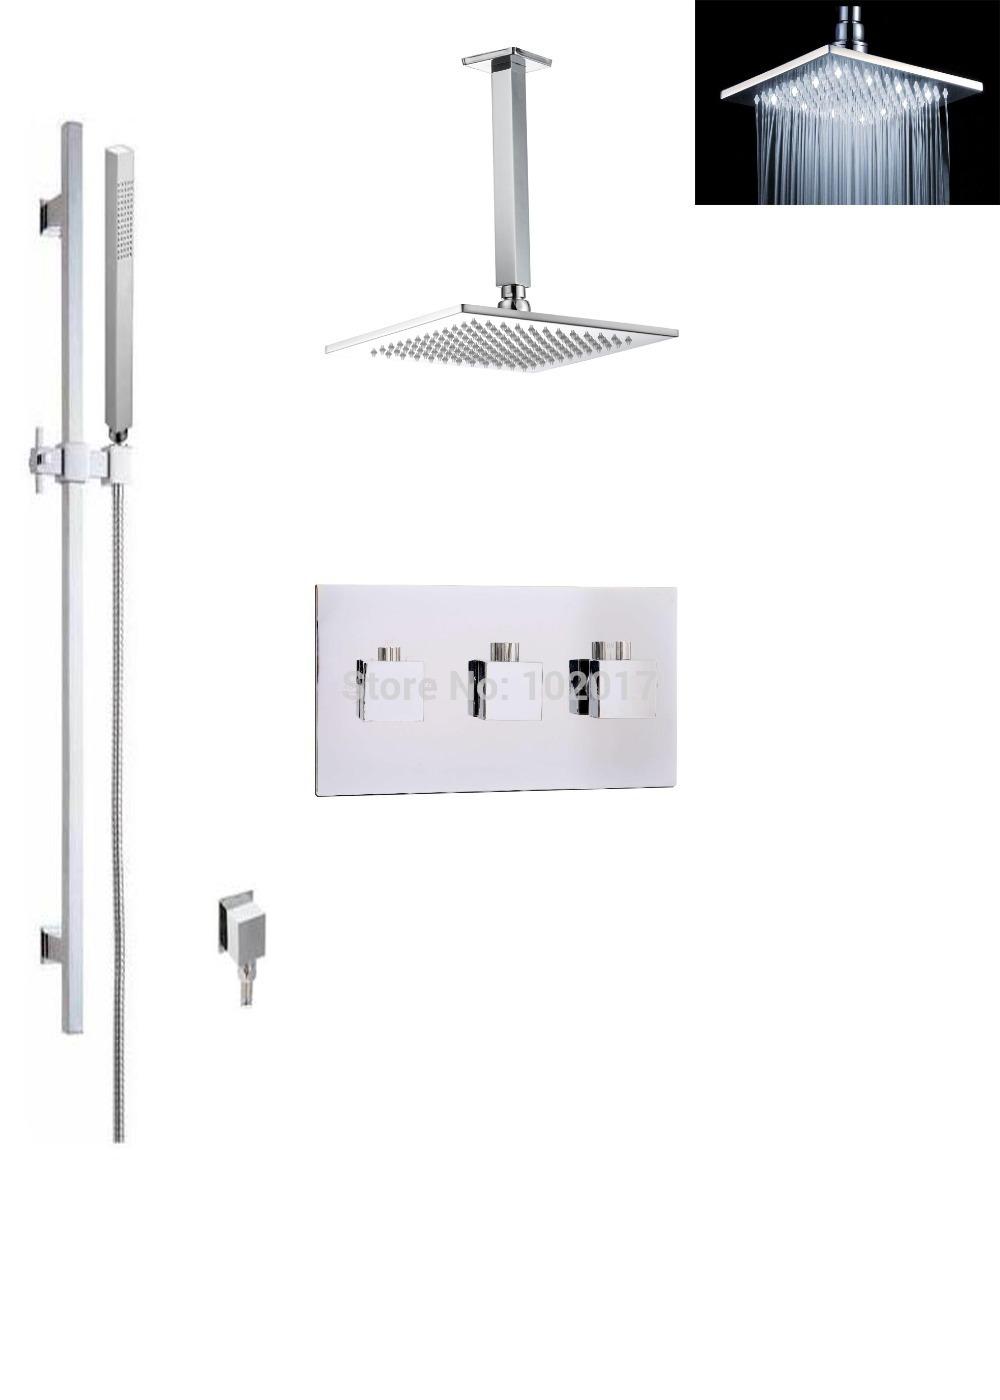 retail and wholesale white led bath thermostatic shower set(China (Mainland))